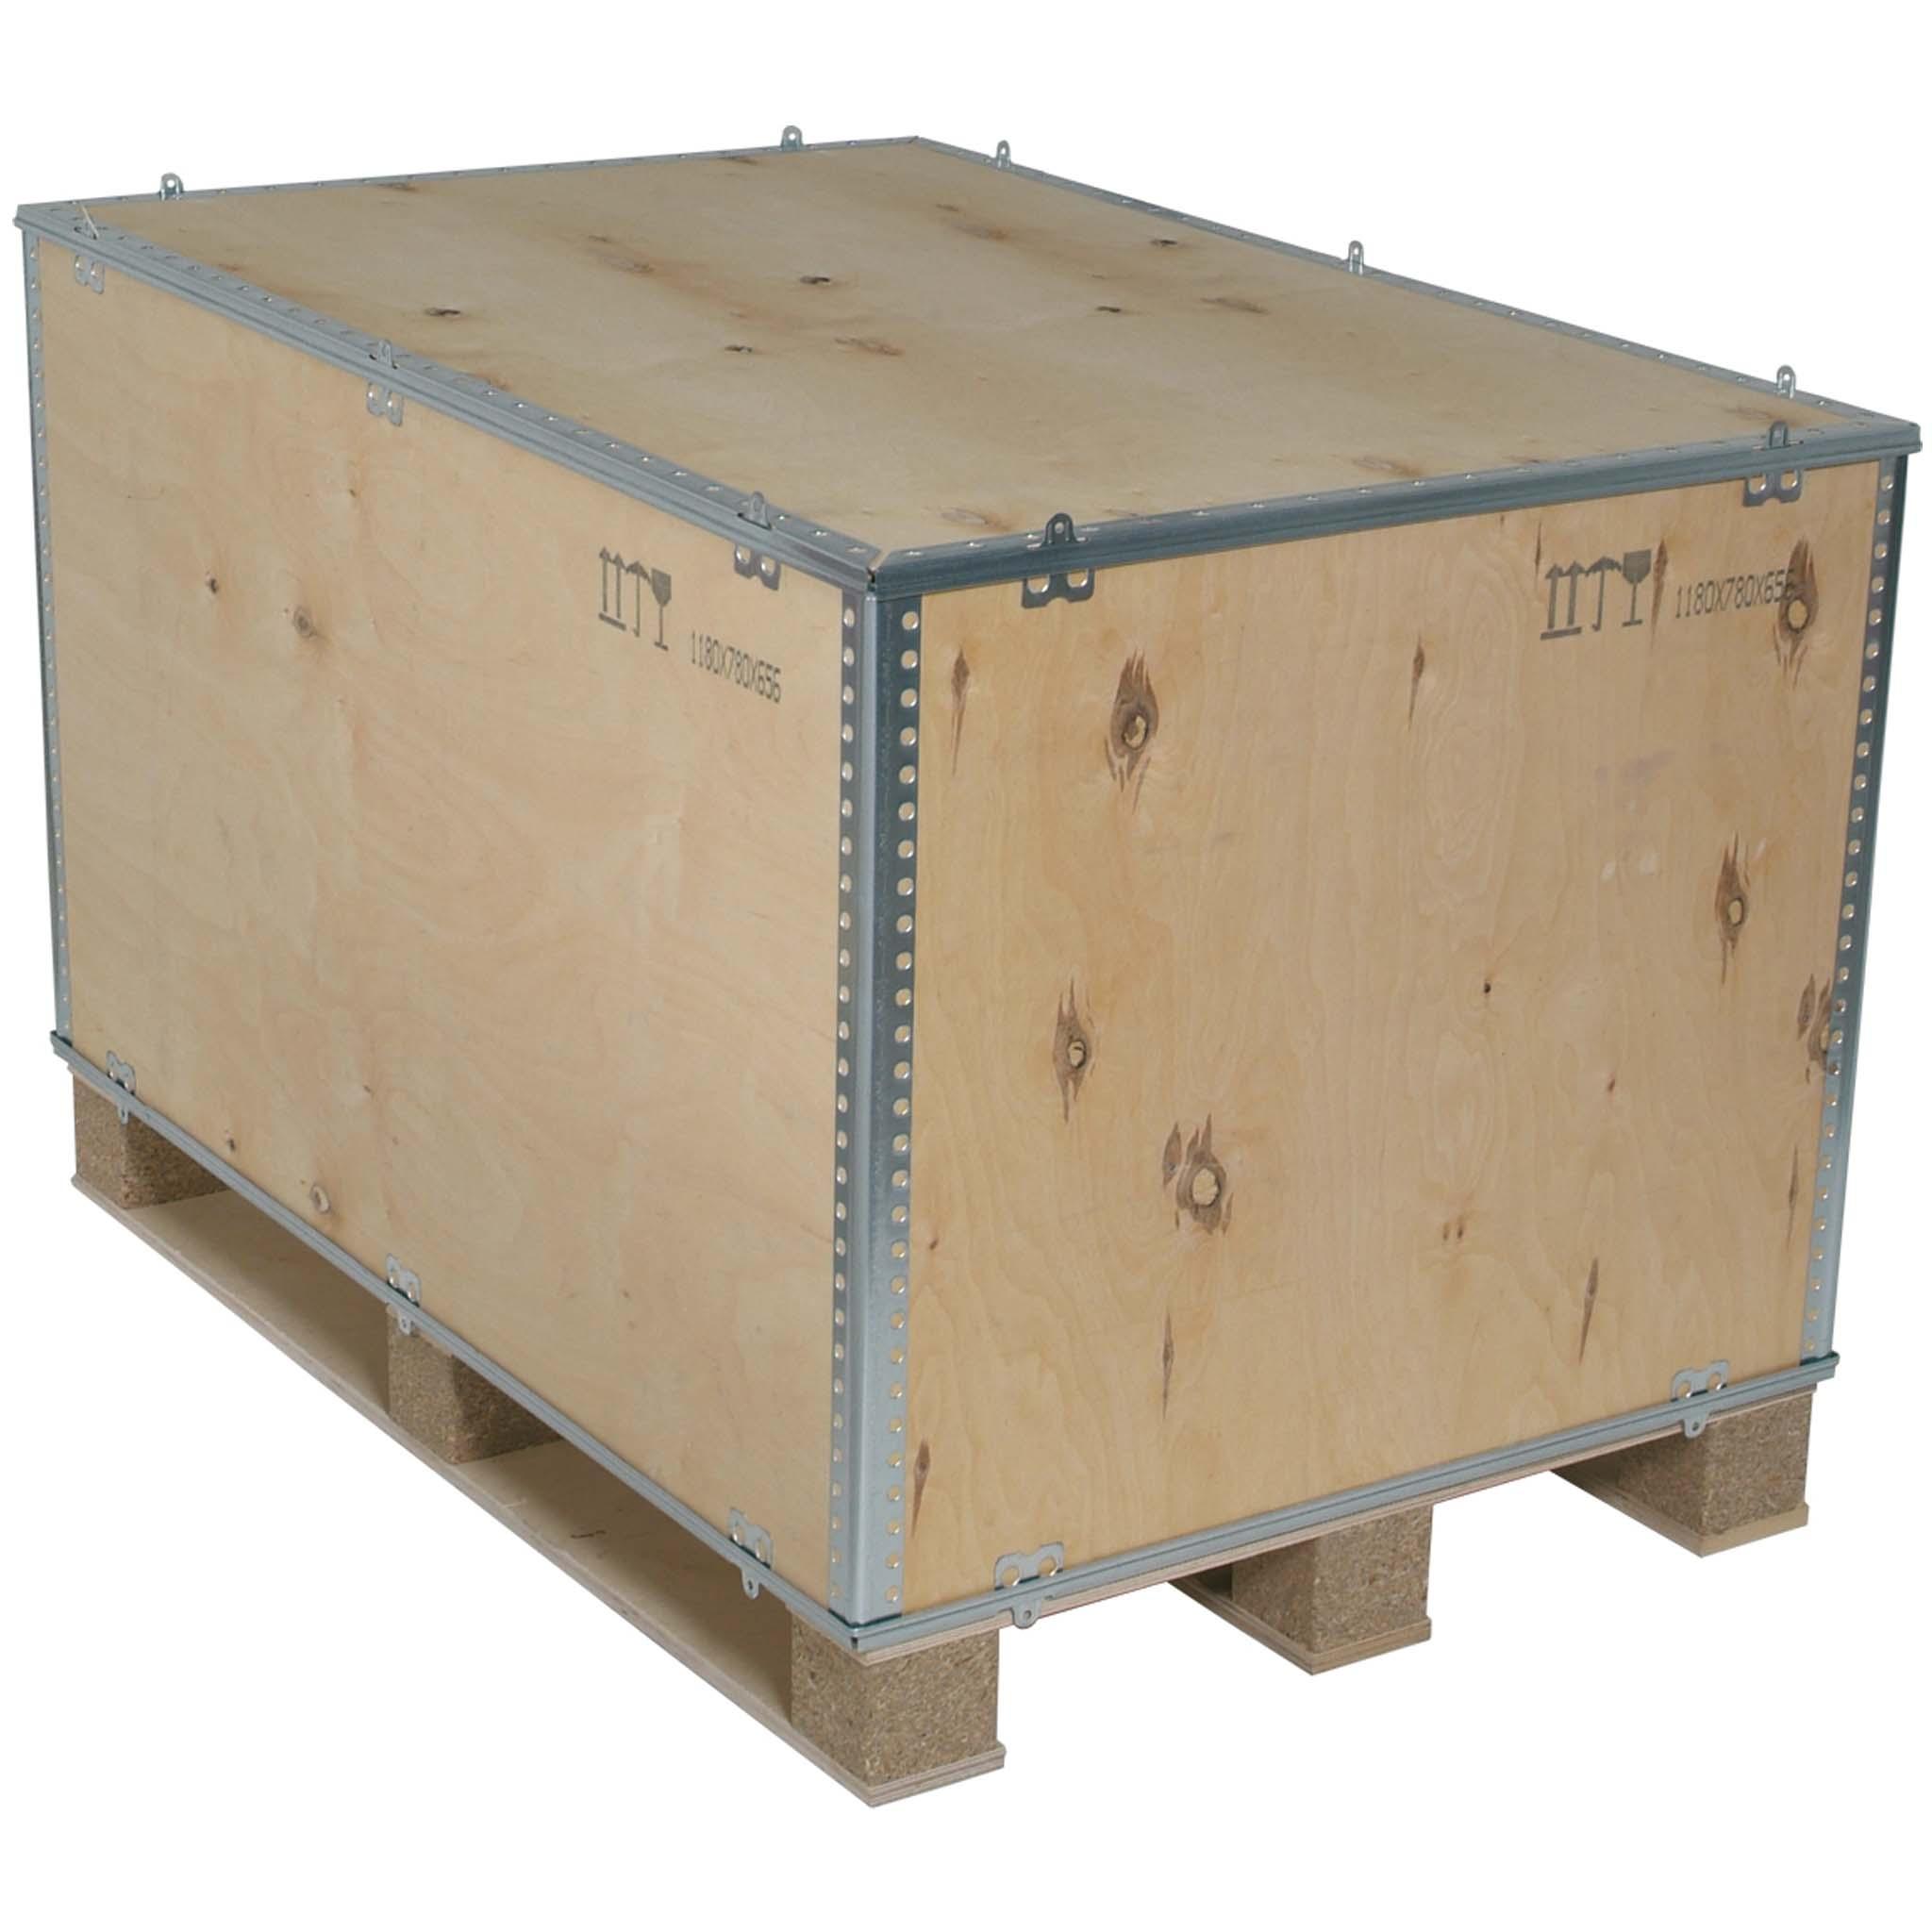 Cargo Boxen | 1.200 X 1.000 X 740 mm | mit Palettenunterbau